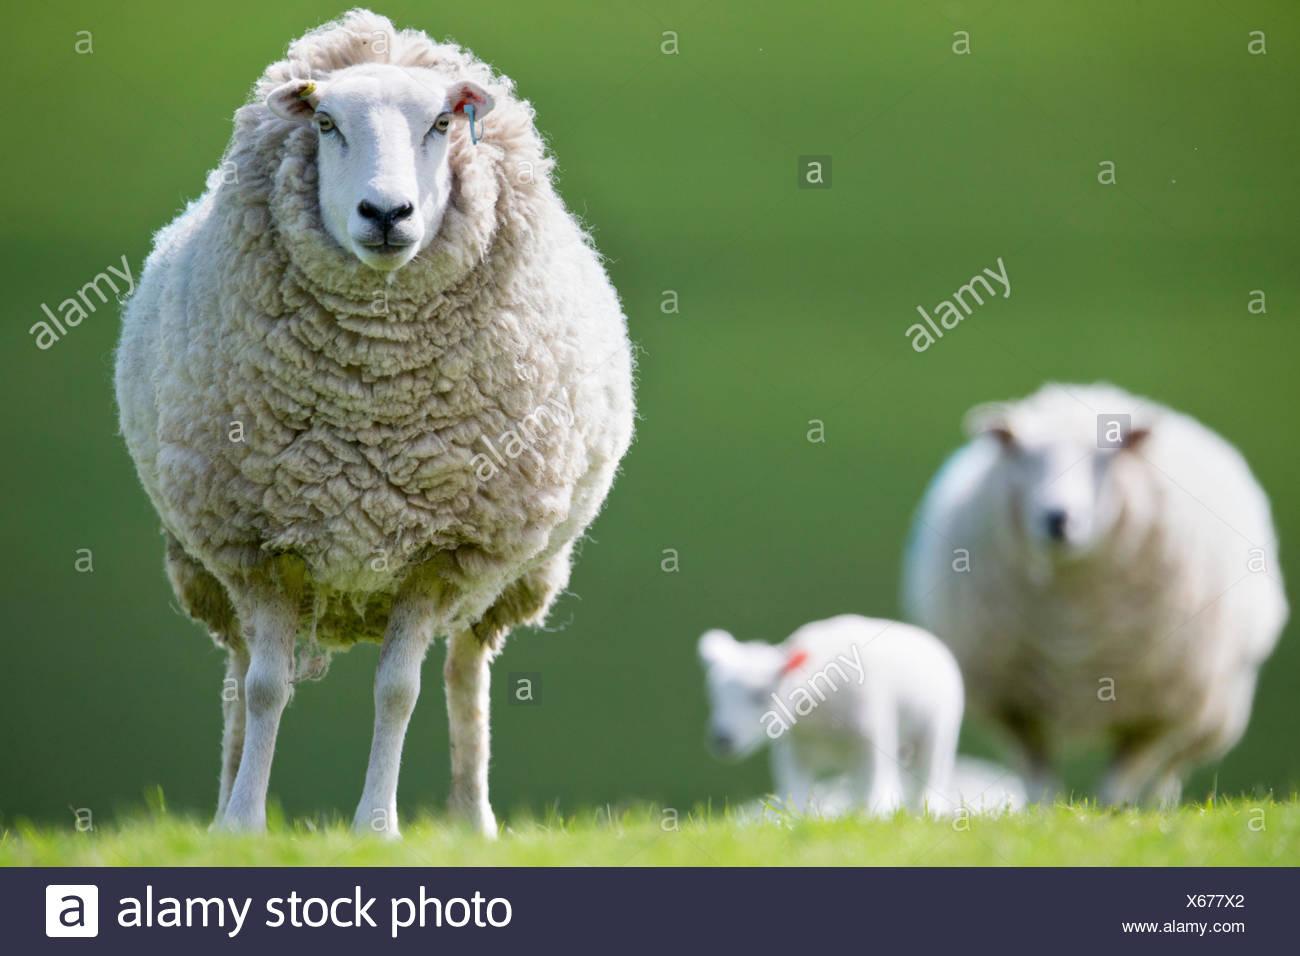 Porträt-Schafe im Frühjahr Rasen Stockbild